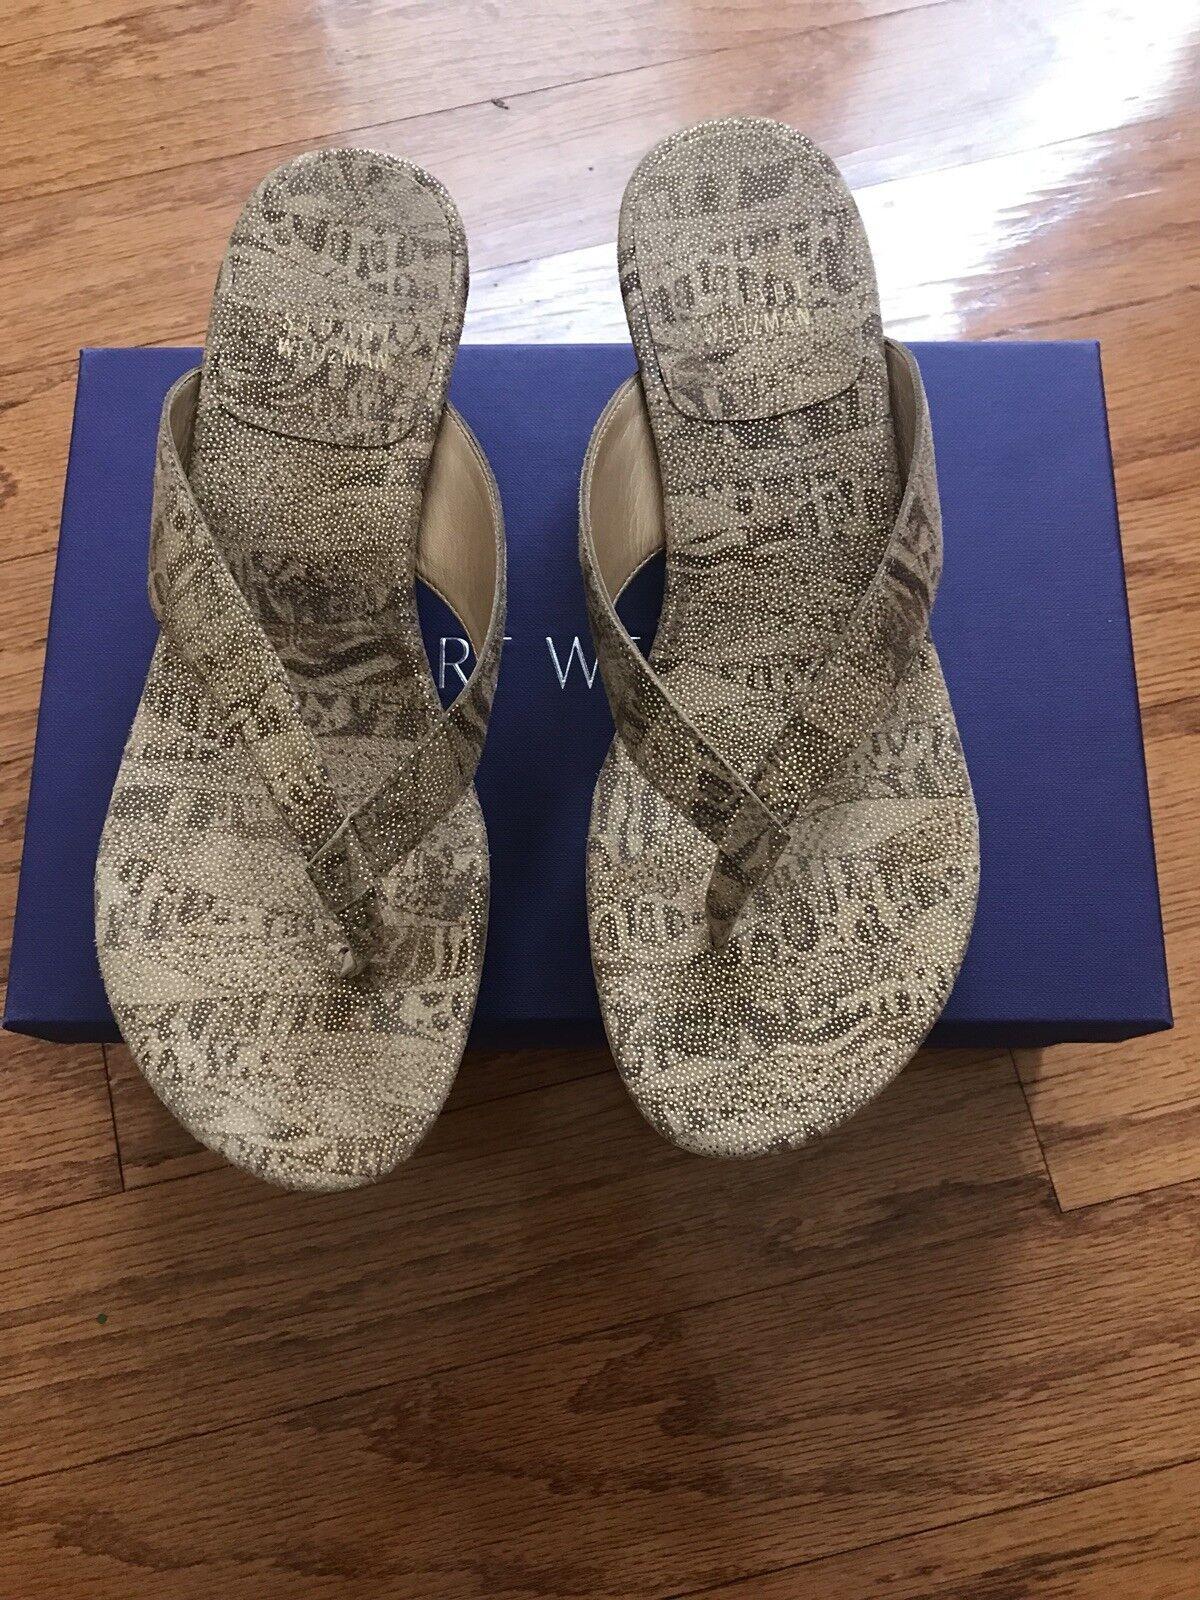 New STUART WEITZMAN gold Animal Print Wedge Sandal Size 7 7 7 8c31ac